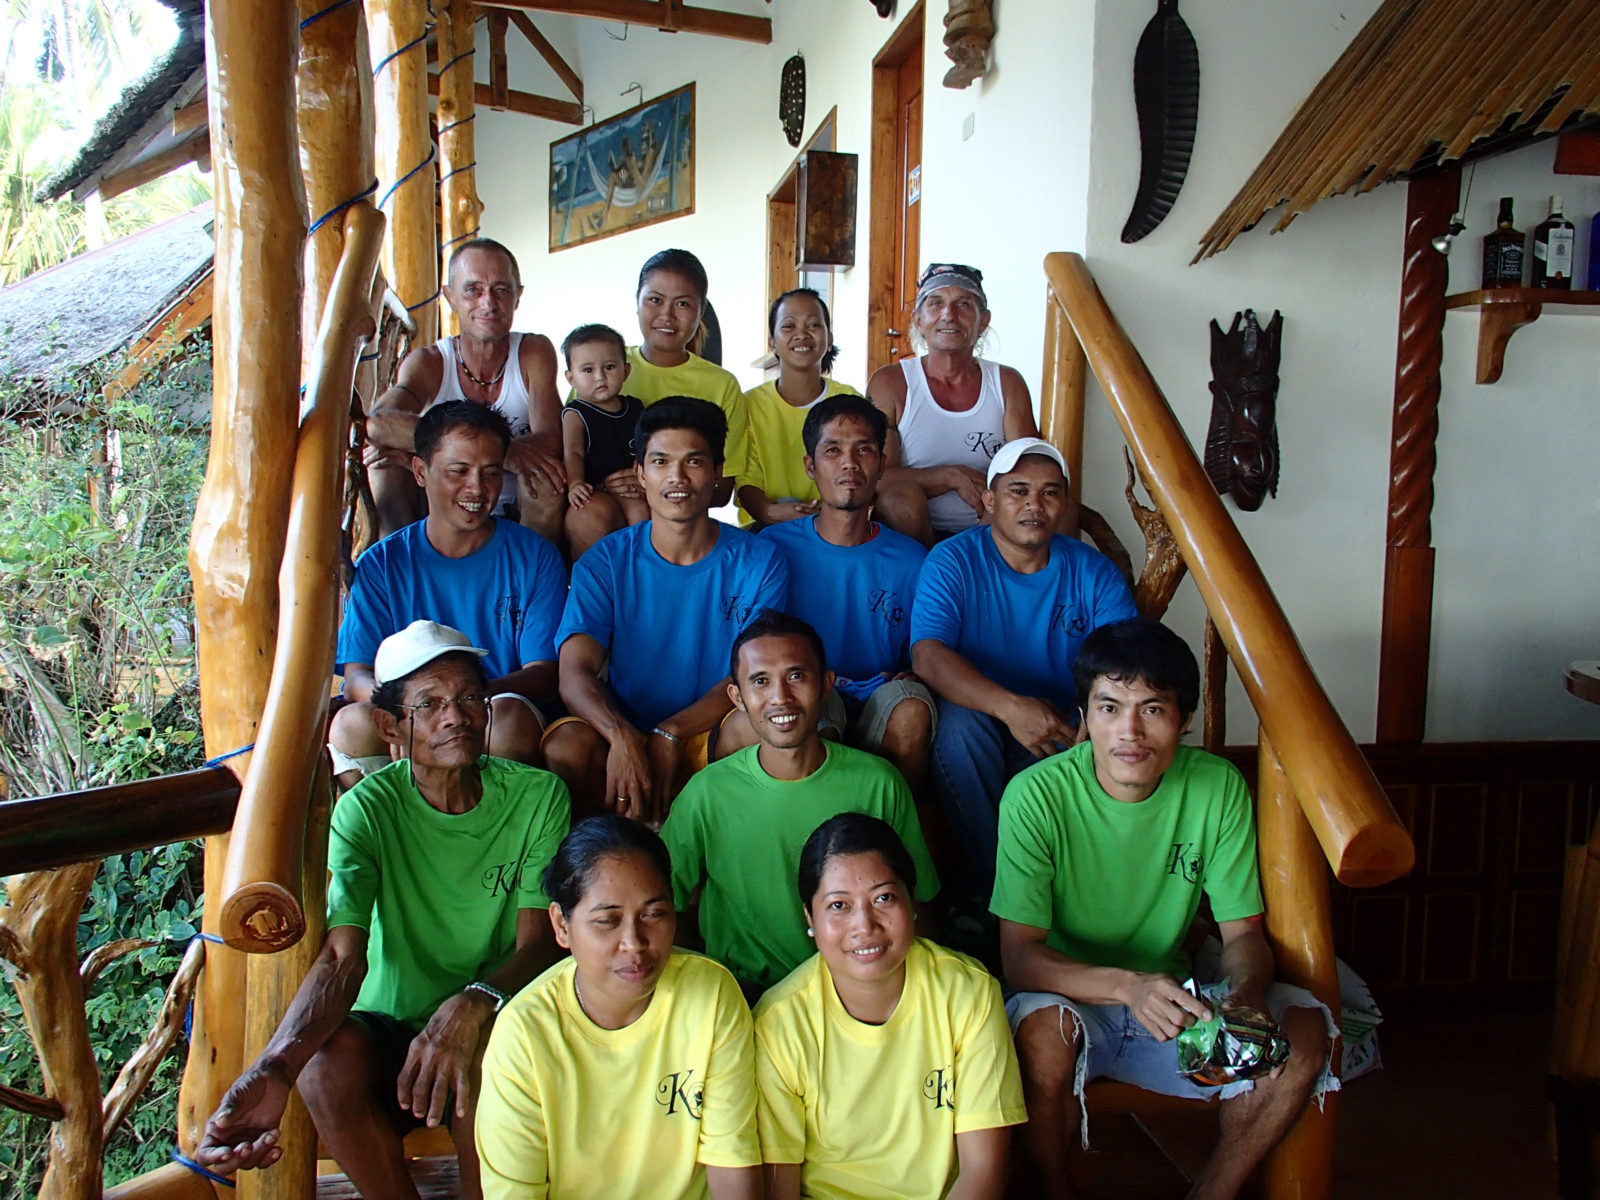 Team Kalachuchi 2014